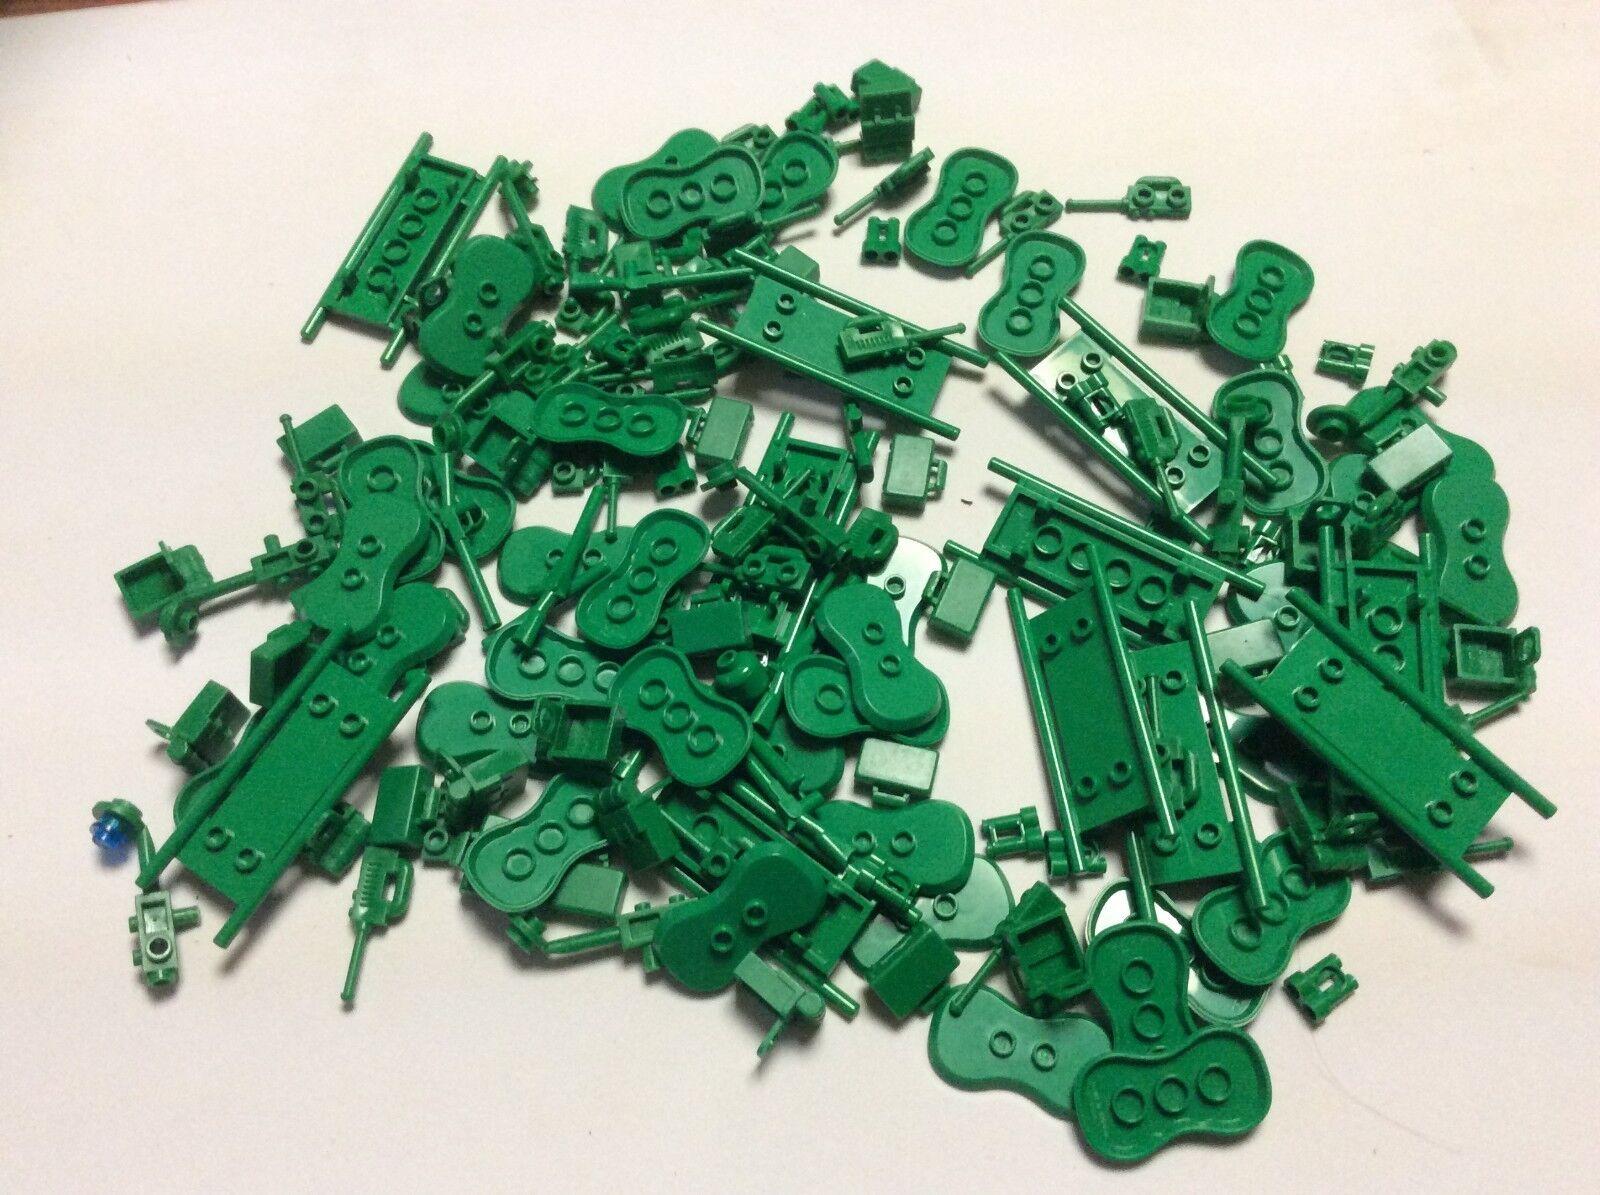 LEGO Lot 4 Ounces Toy Story Army Minifigure Minifigure Minifigure minifig Accessories Soldiers O462M 9ee8e8